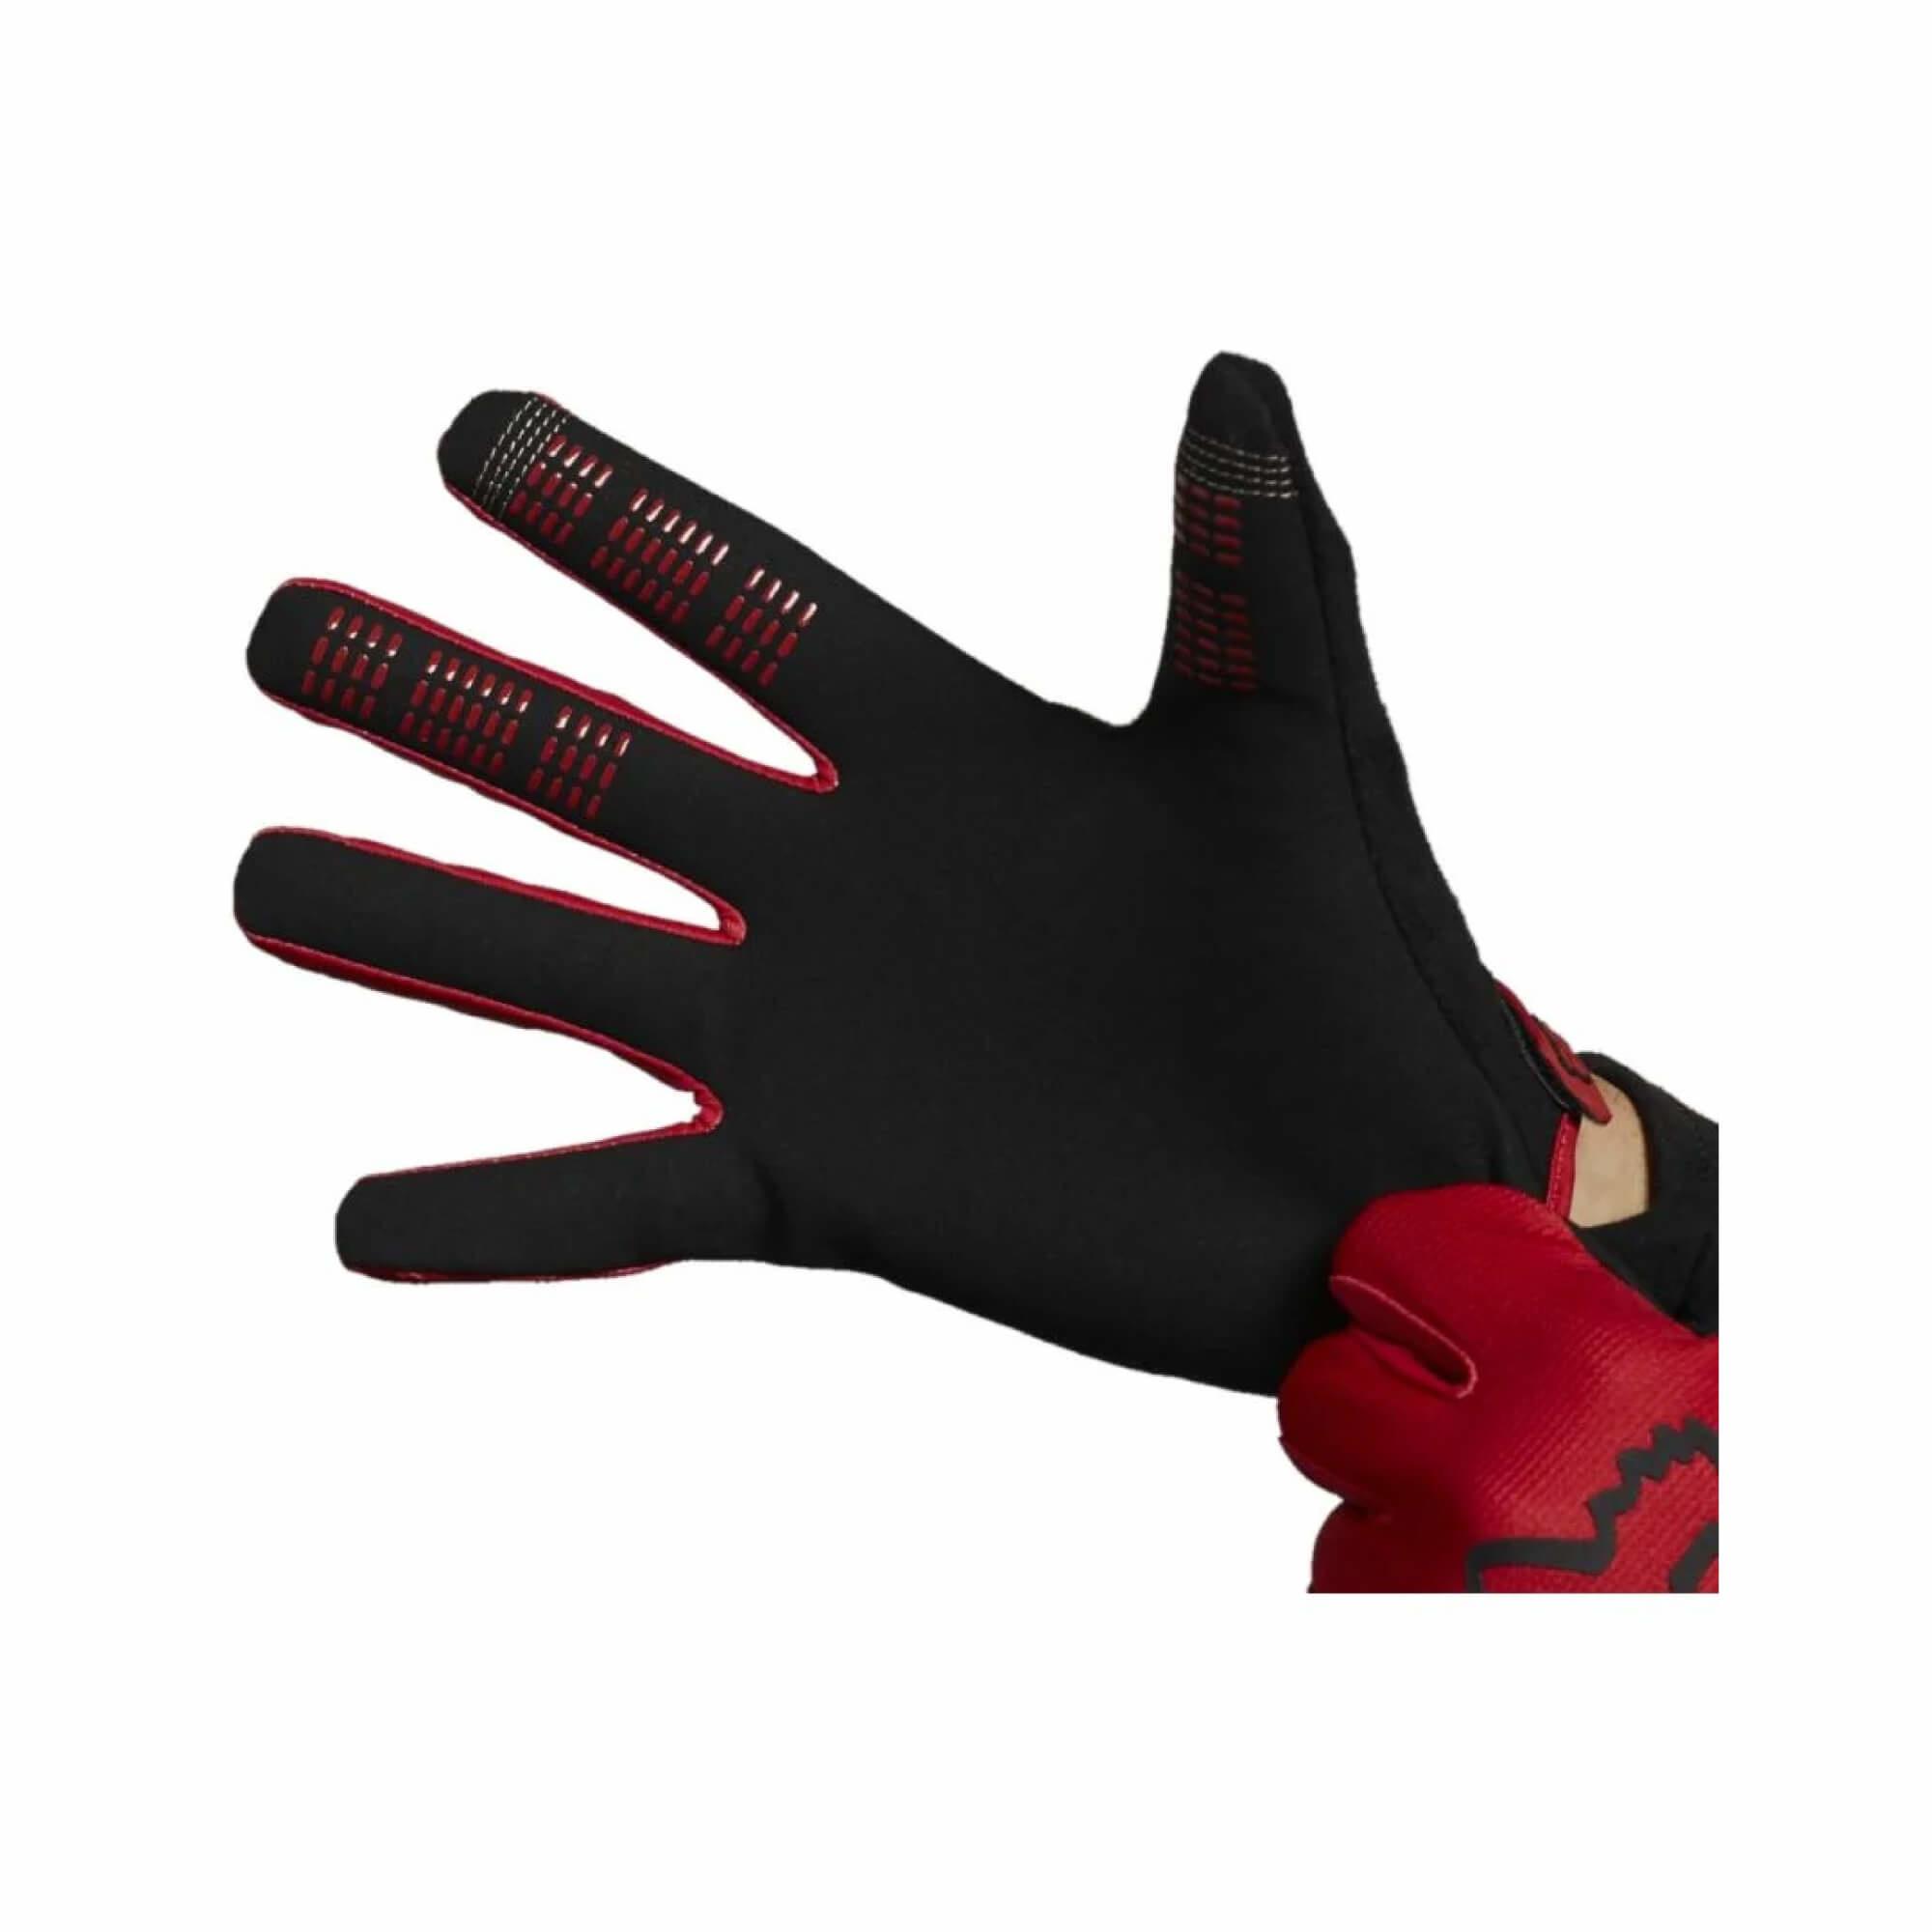 Ranger Glove 2021-4